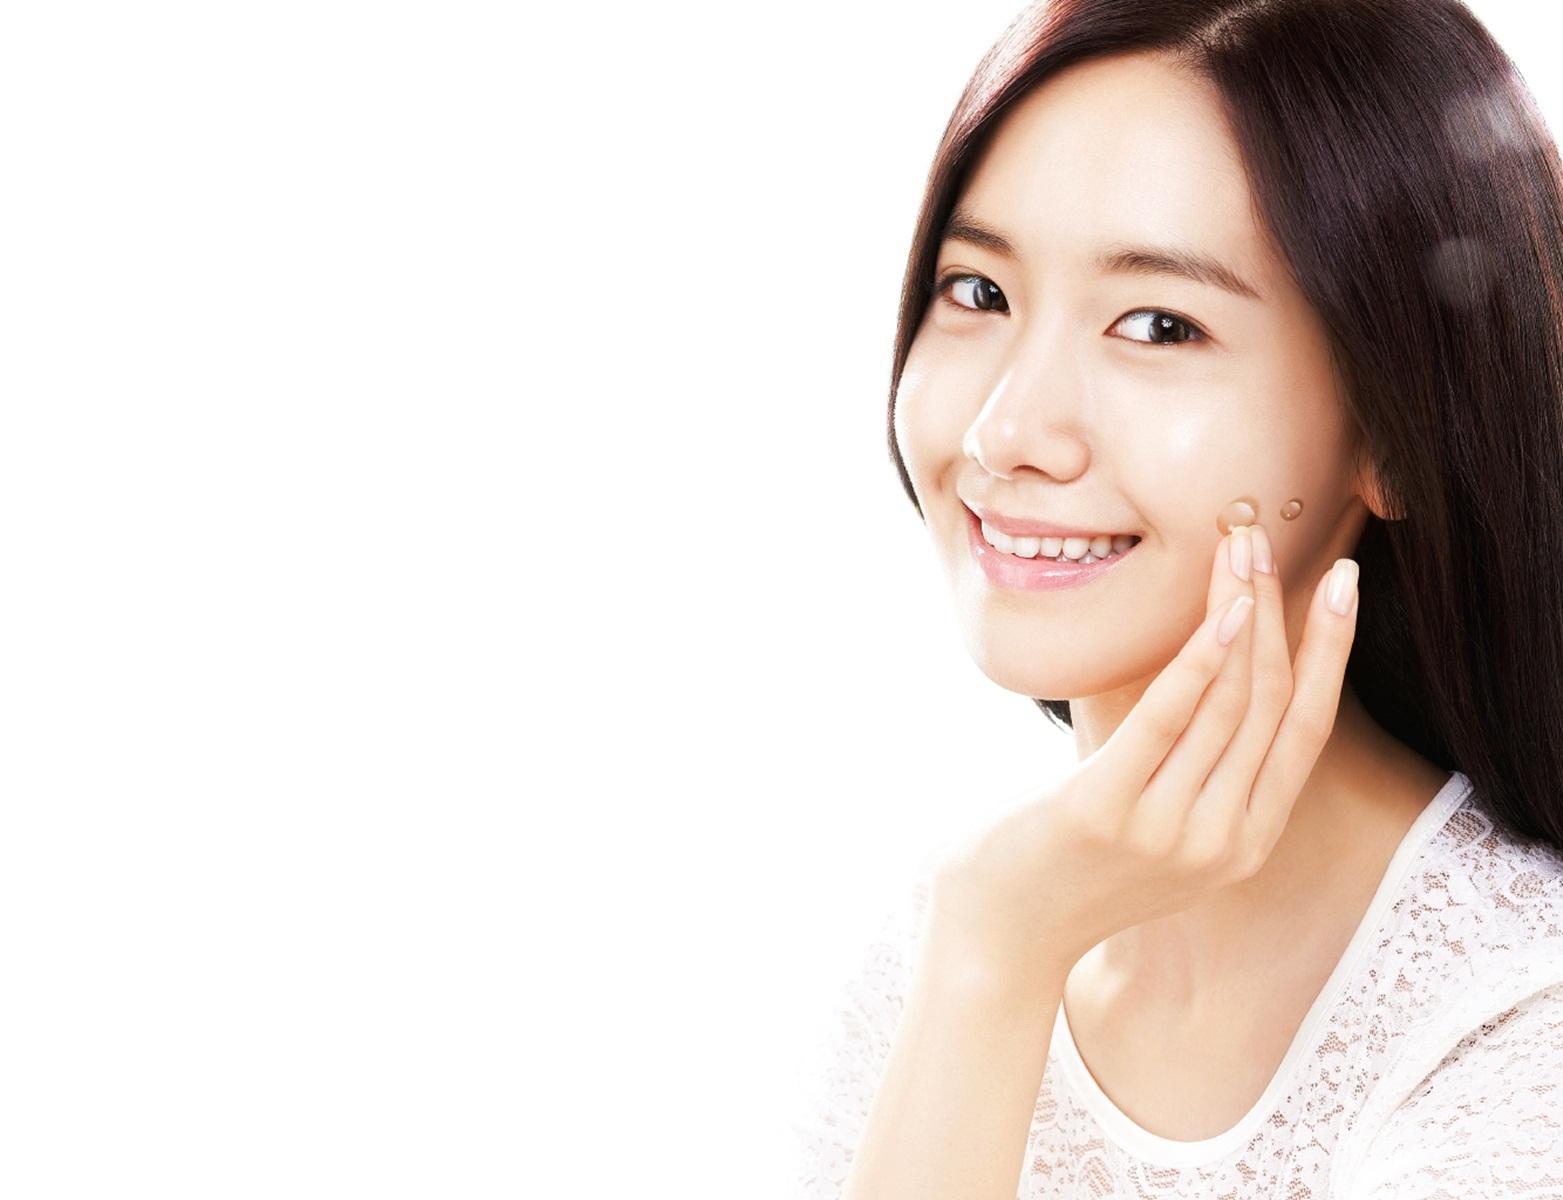 Yoona Wallpaper Hd 1563x1200